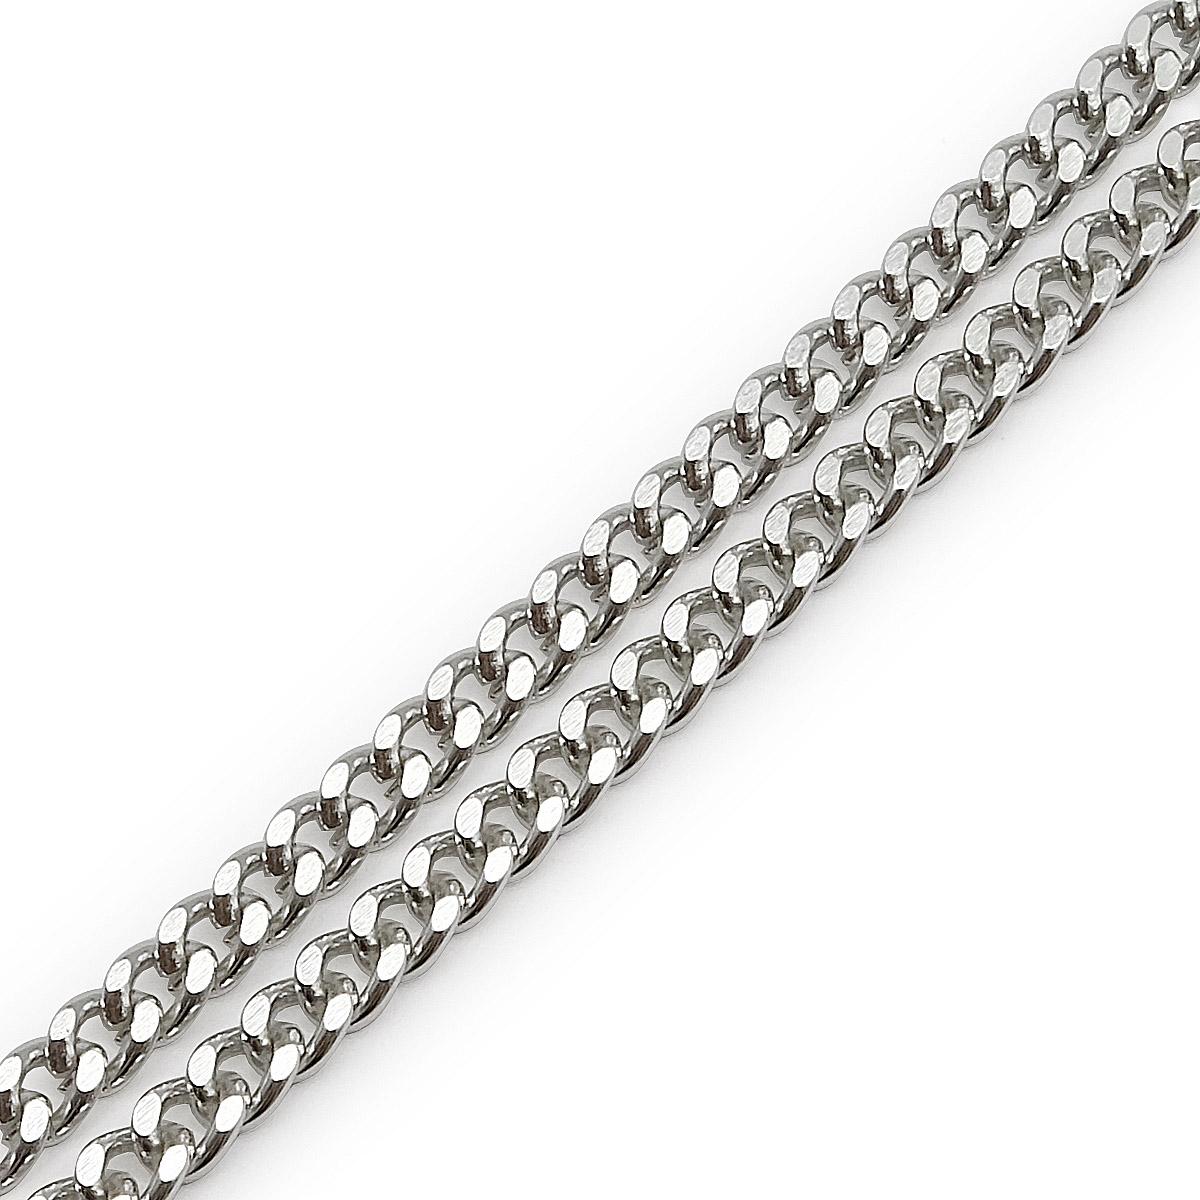 К18601 Цепь алюминиевая, 5,4х4,4 мм (10 м)